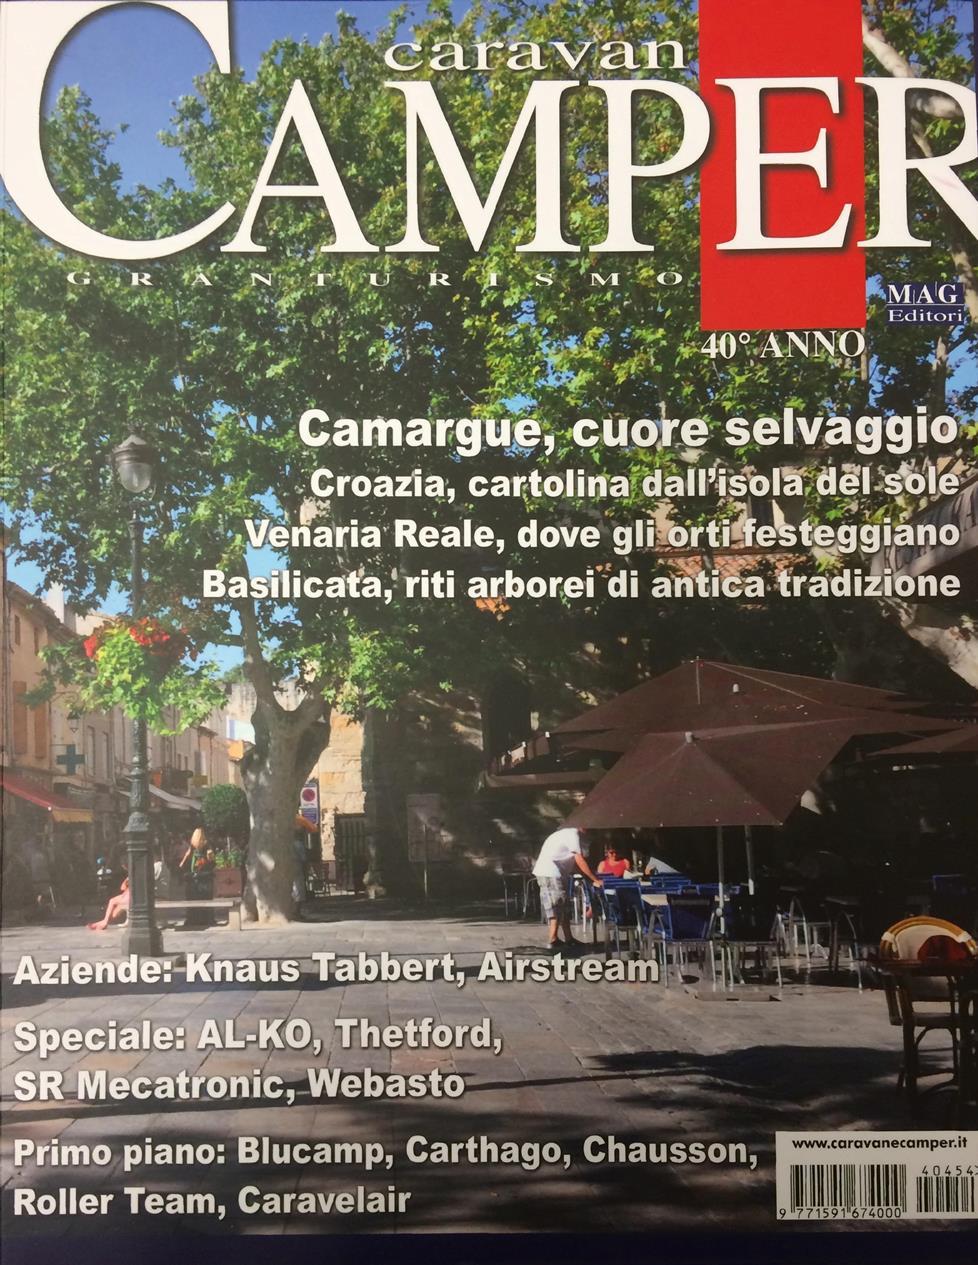 Camper Caravan_2014-page-001